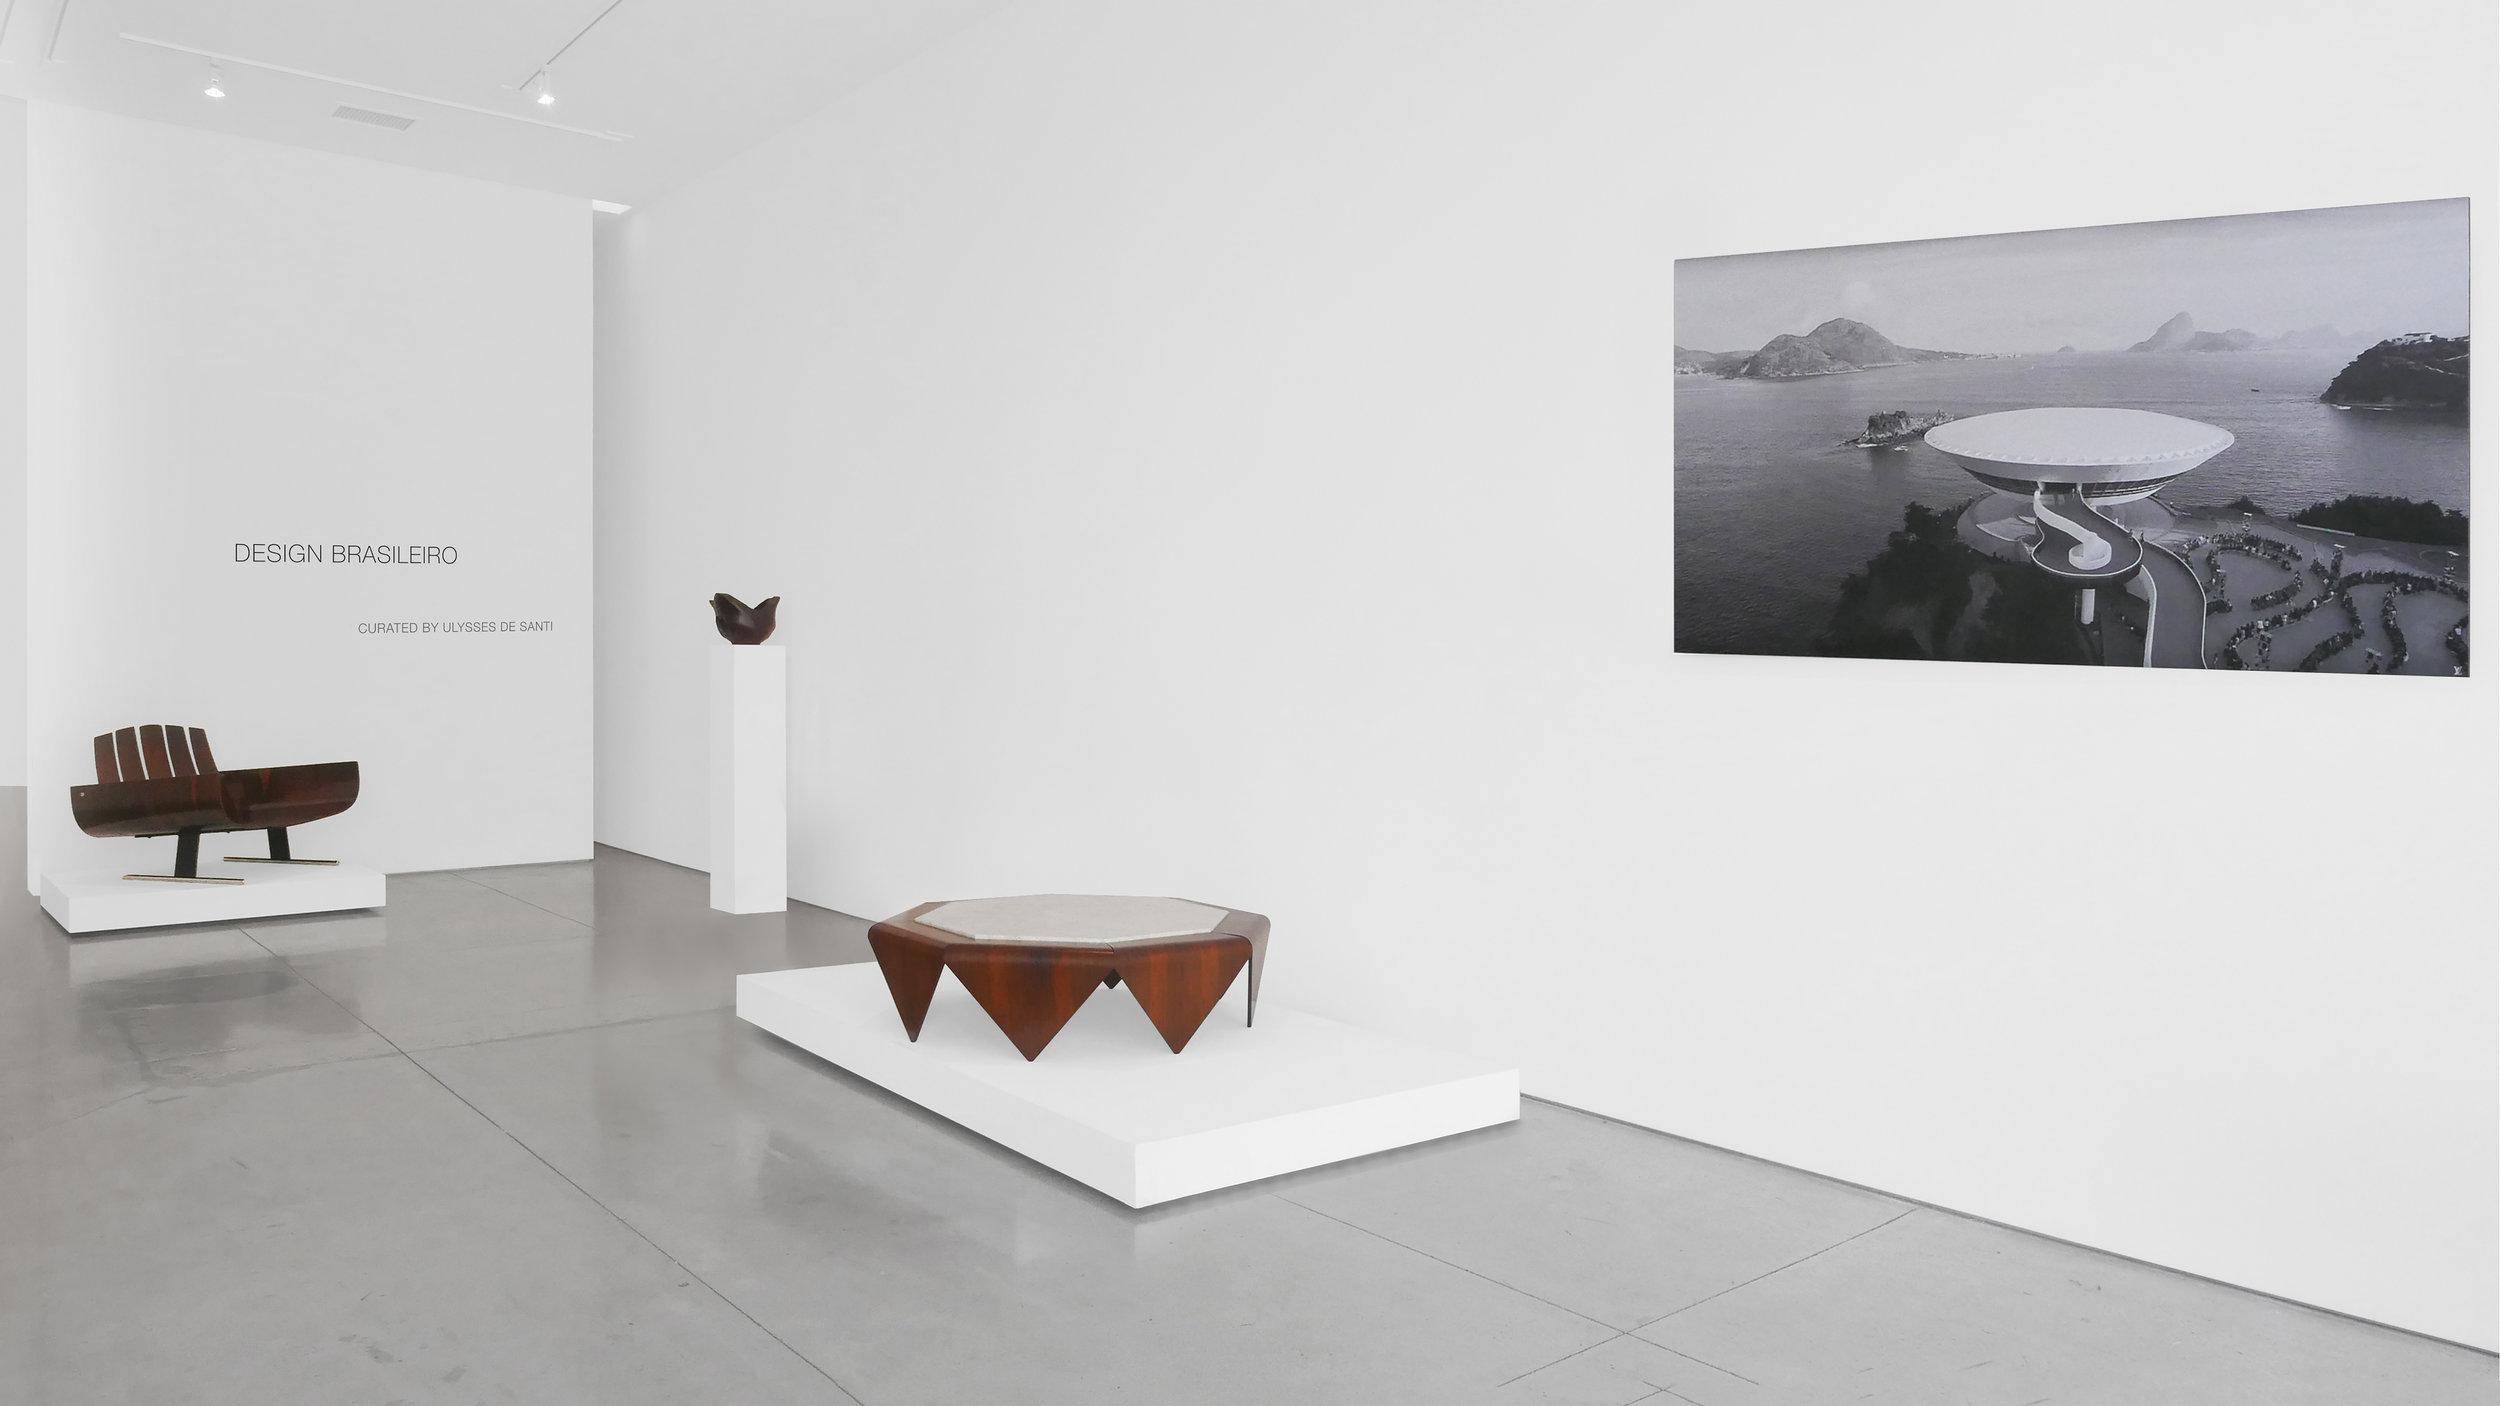 Design Brasileiro, Curated by Ulysses de Santi, Peter Blake Gallery, 2018, Installation View_2.jpg